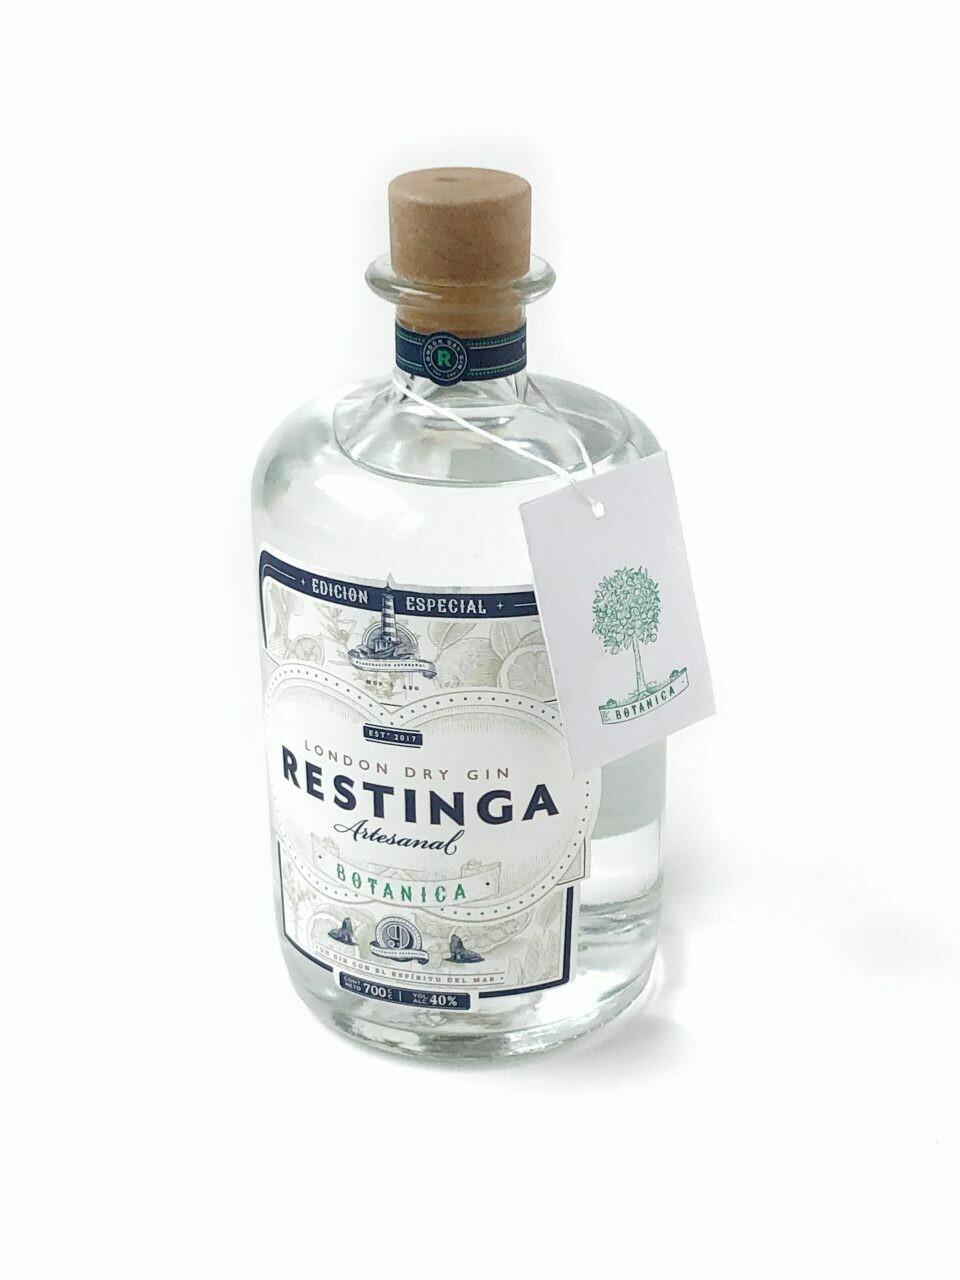 Gin Restinga Botanica London Dry